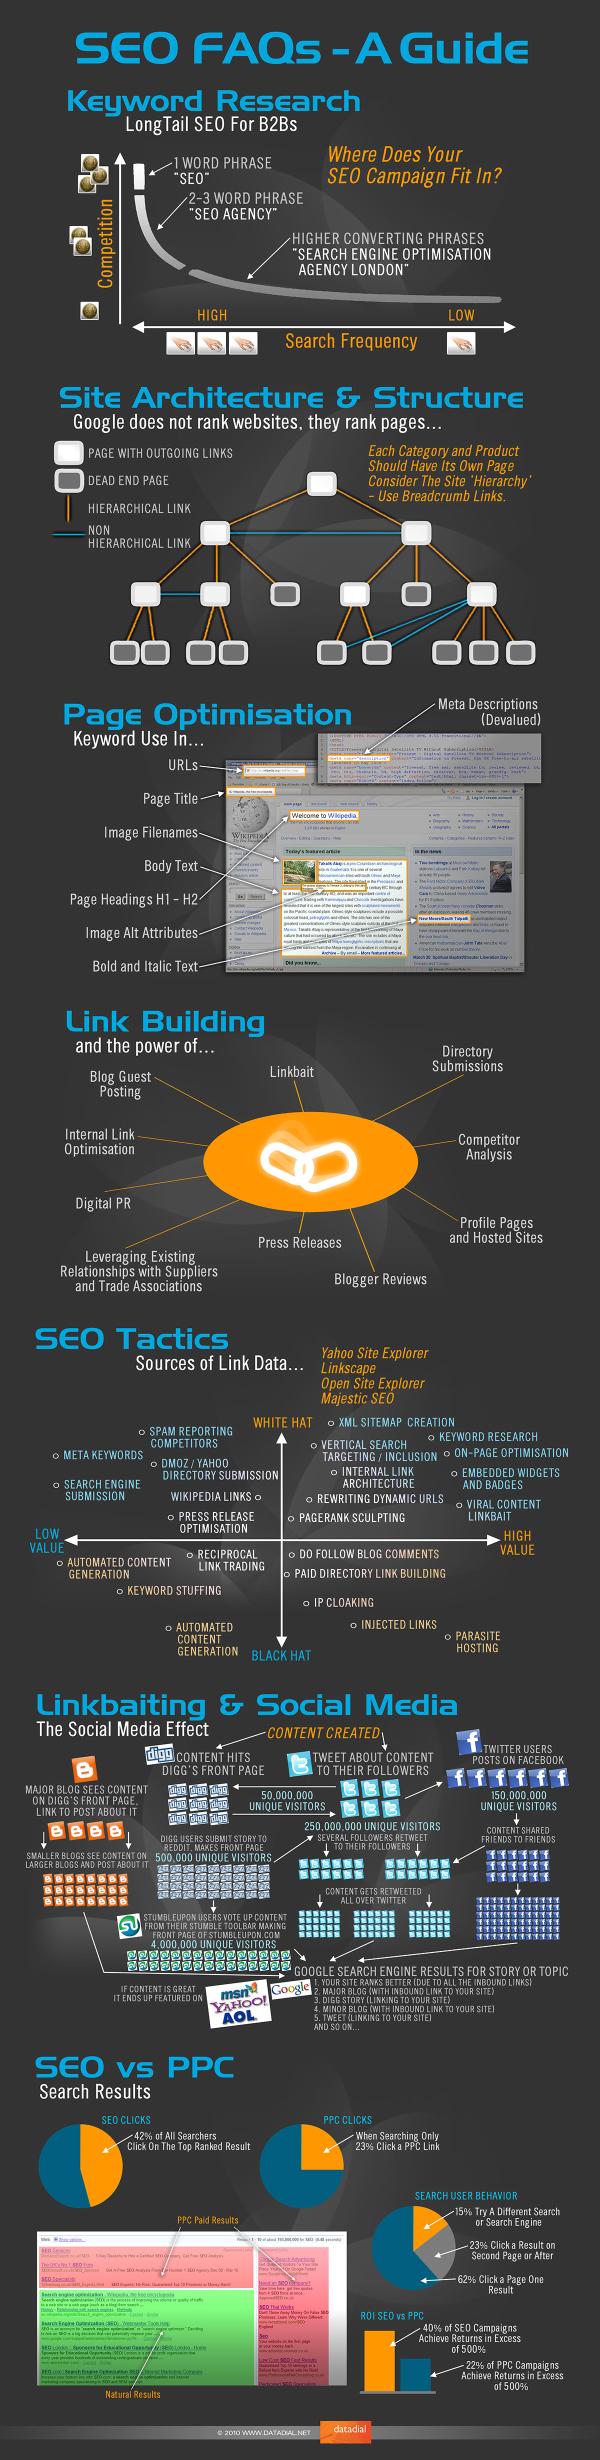 SEO Basics and Optimization